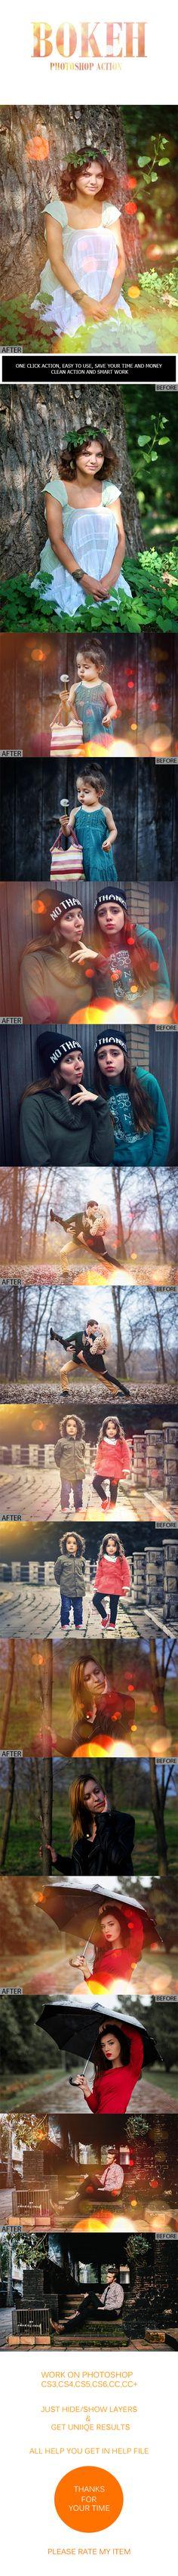 Bokeh Photoshop Action - Photo Effects Actions actions, add-on, bokeh, bokeh action, bokeh effect, bokeh fashion, bokeh light, camera, cityscape, color action, color effect, depth, edition, effect, fashion, lens blur, light